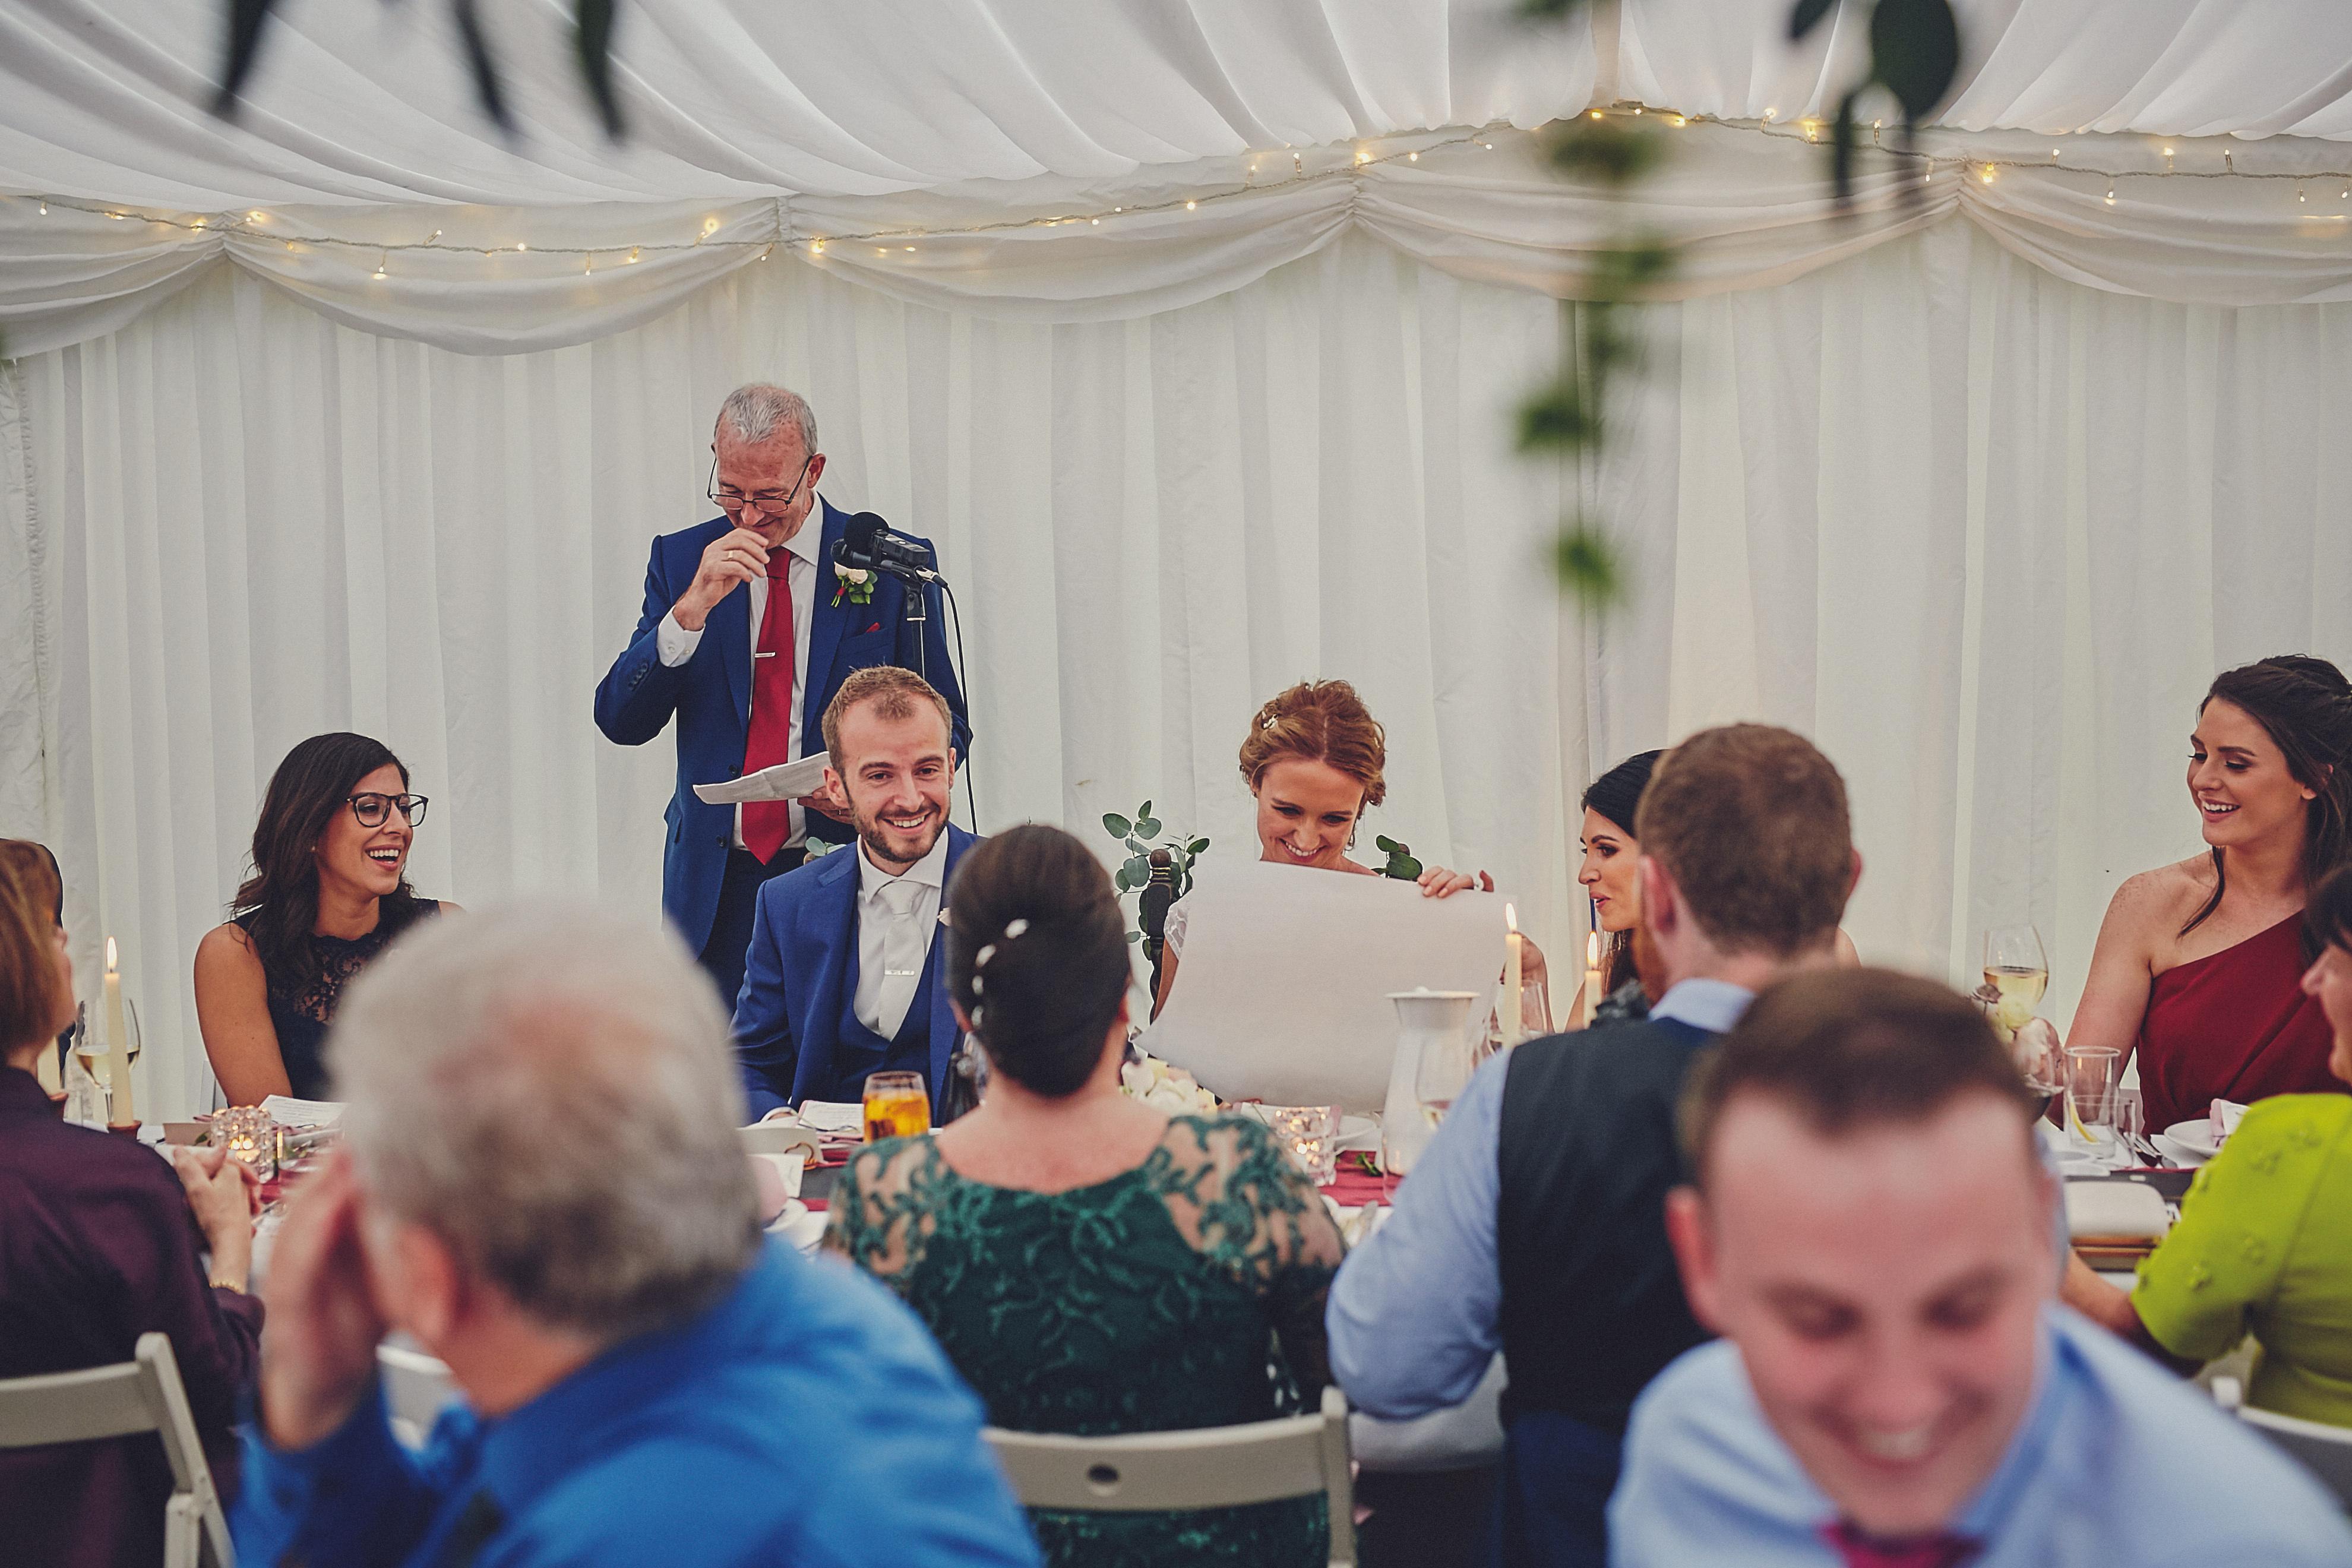 Cloughjordan House weddding134 - Cloughjordan House Wedding - Alternative Venue